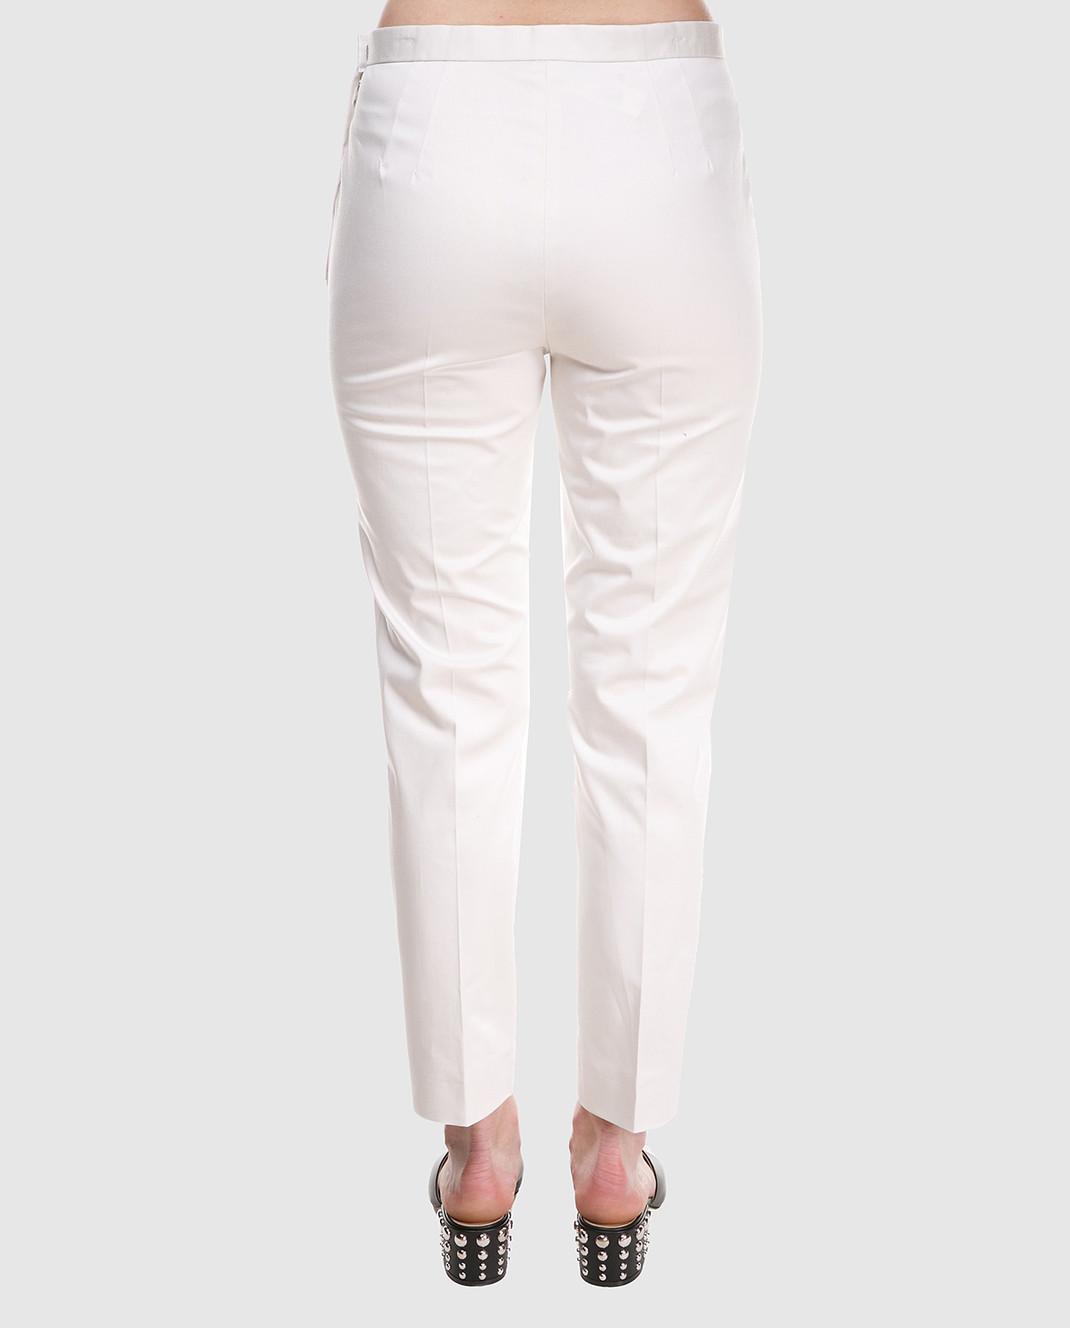 Marc Jacobs Белые брюки M4007166 изображение 4